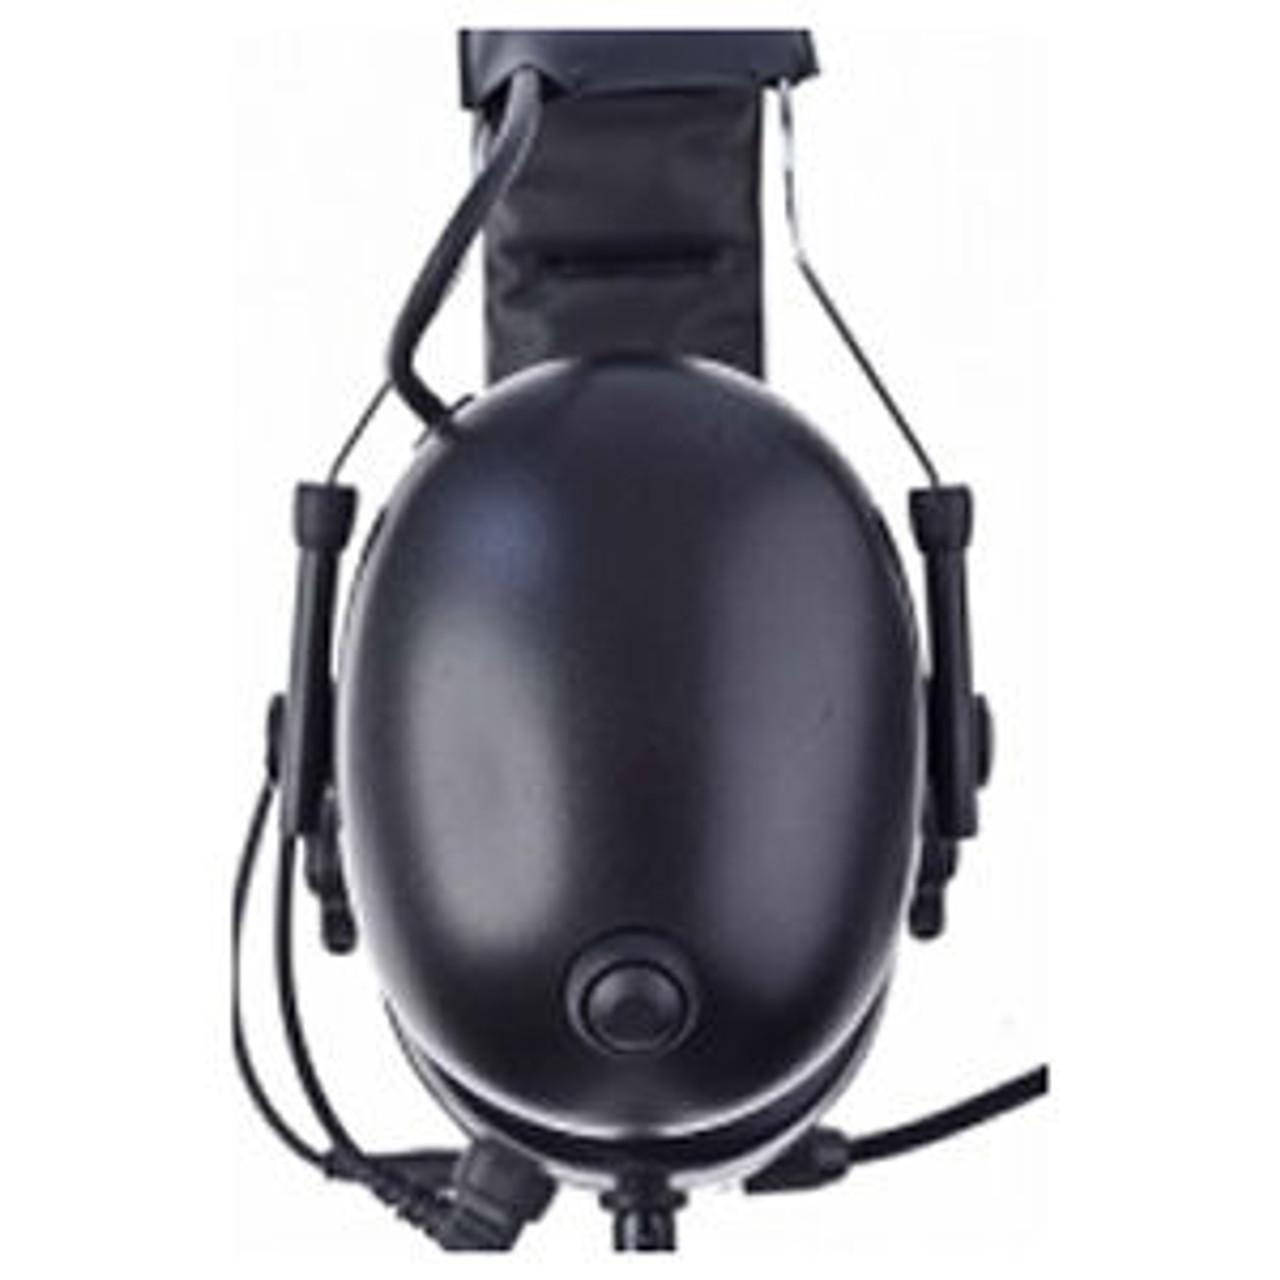 Bendix King GPHX Over The Head Double Muff Headset